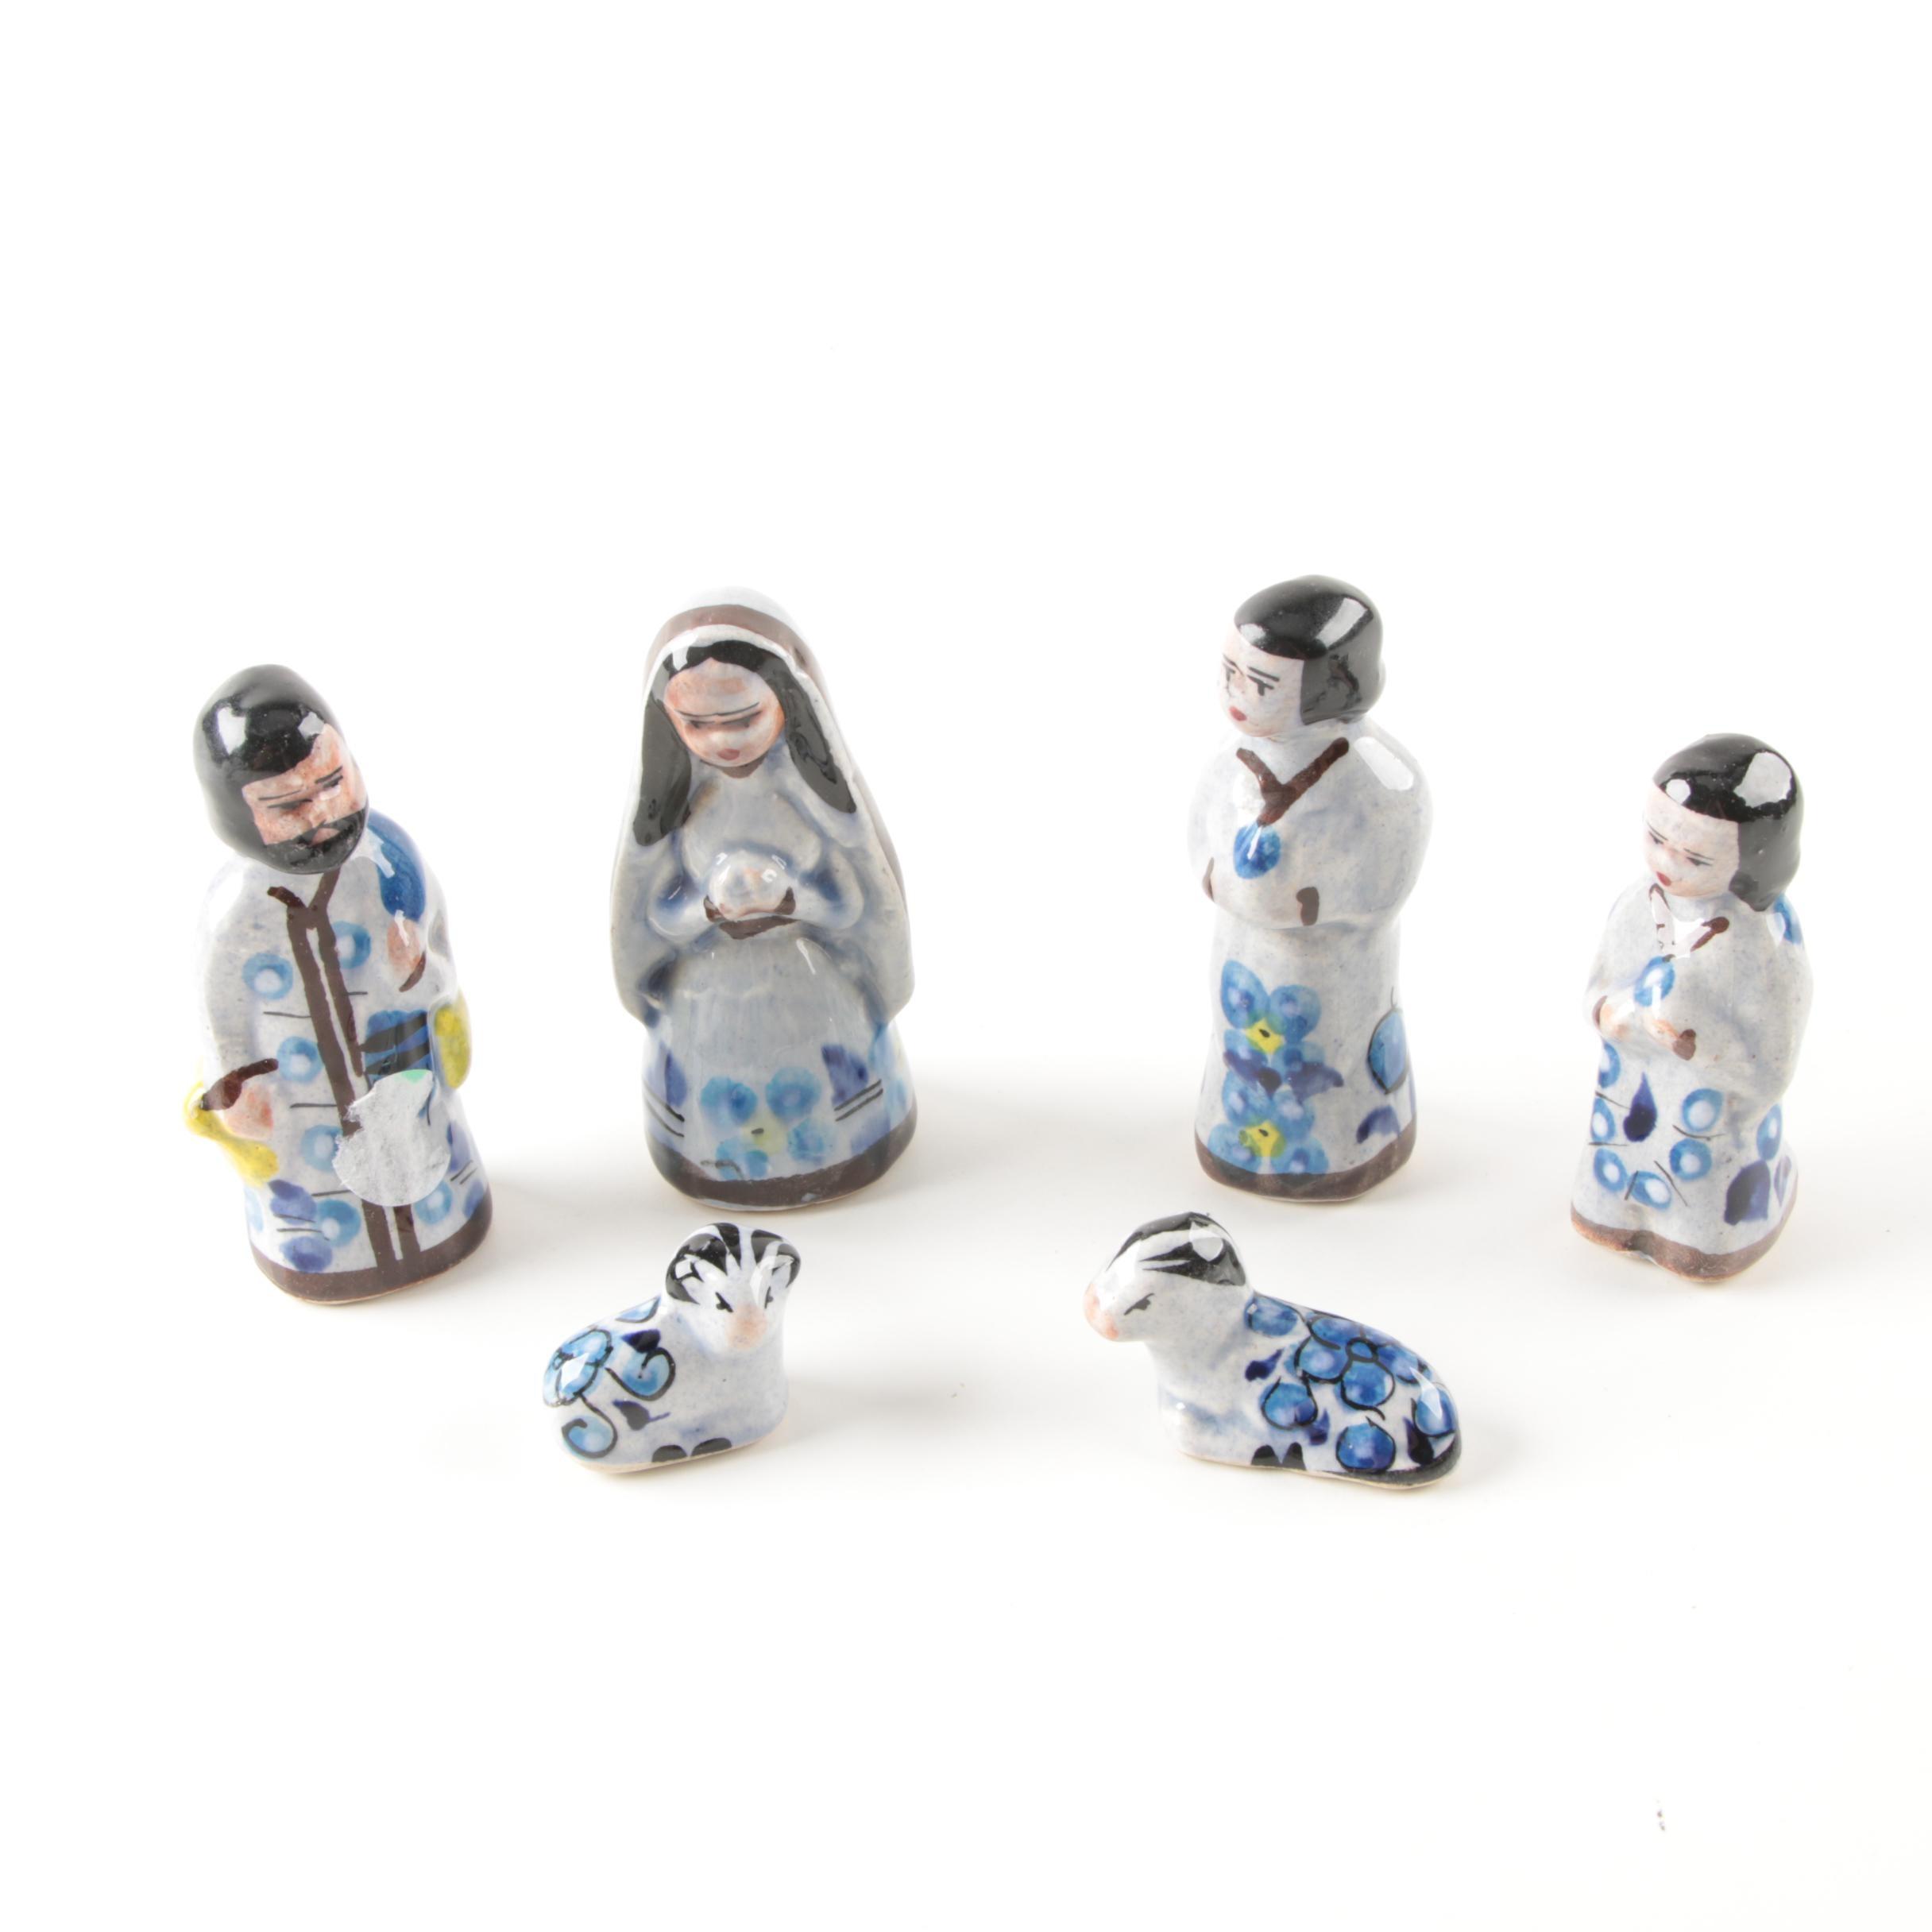 Hand Painted Ceramic Nativity Figurines